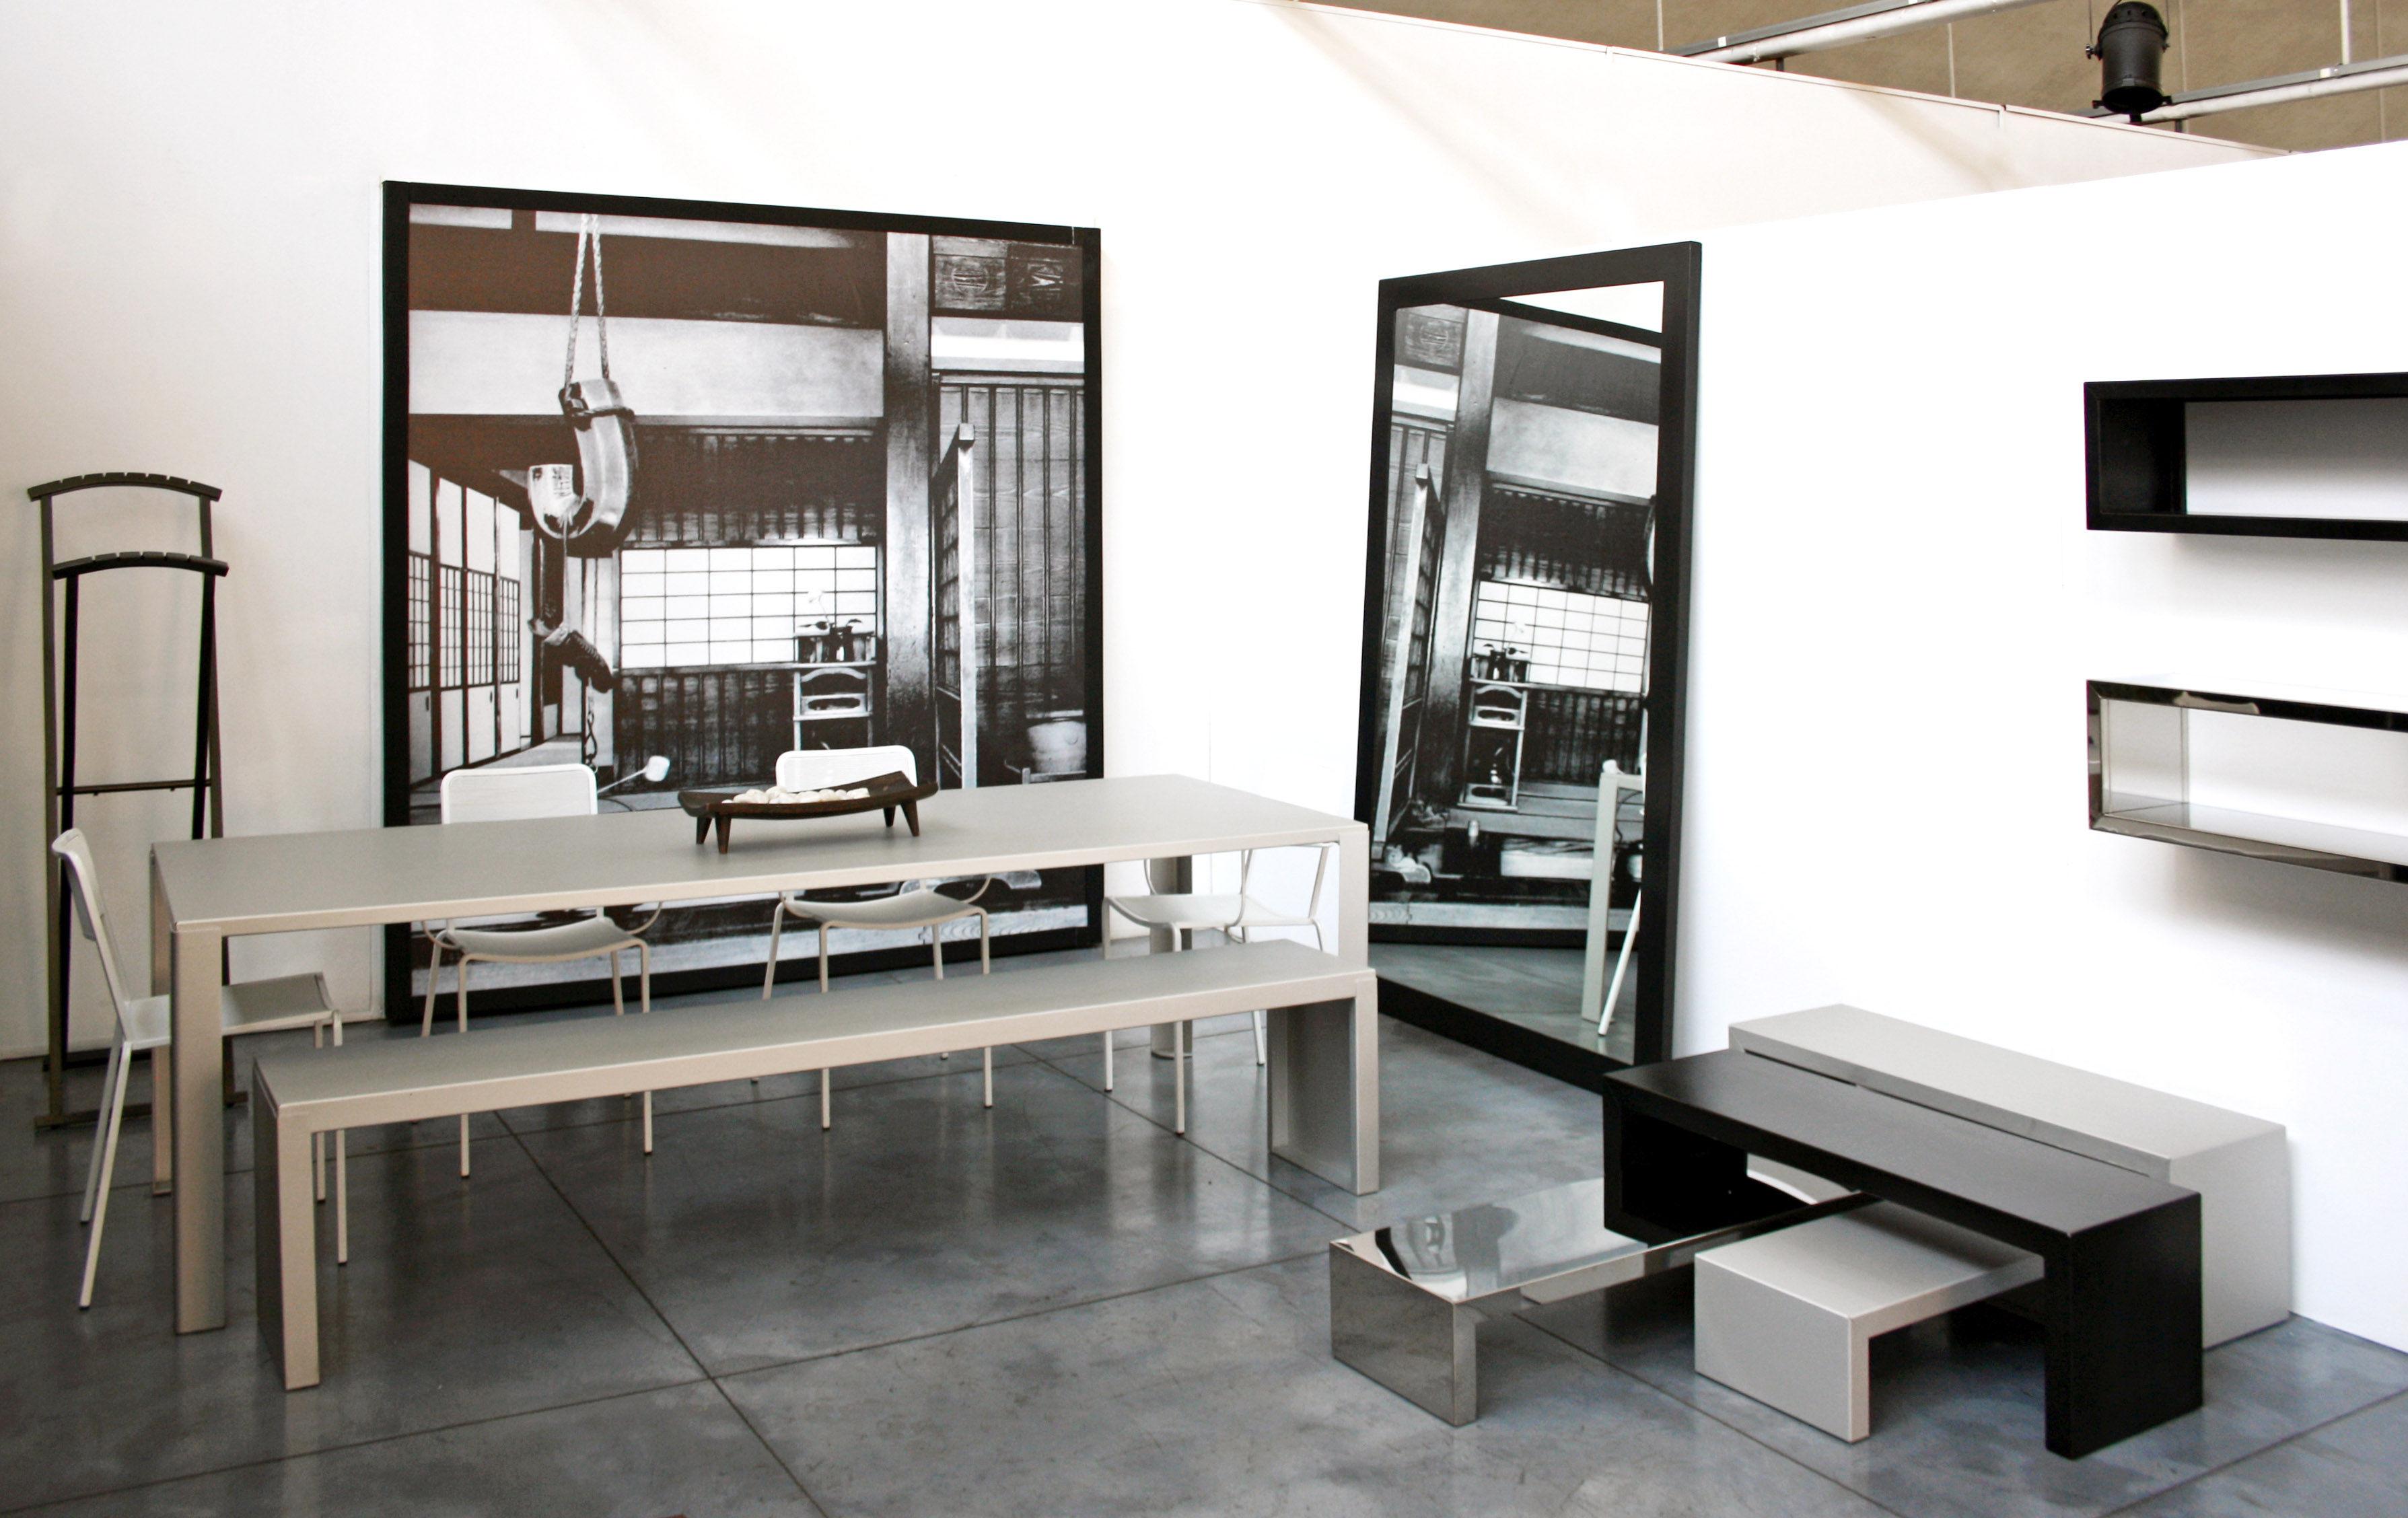 Etag re inox wall rack finition miroir l 160 cm zeus for Immense miroir